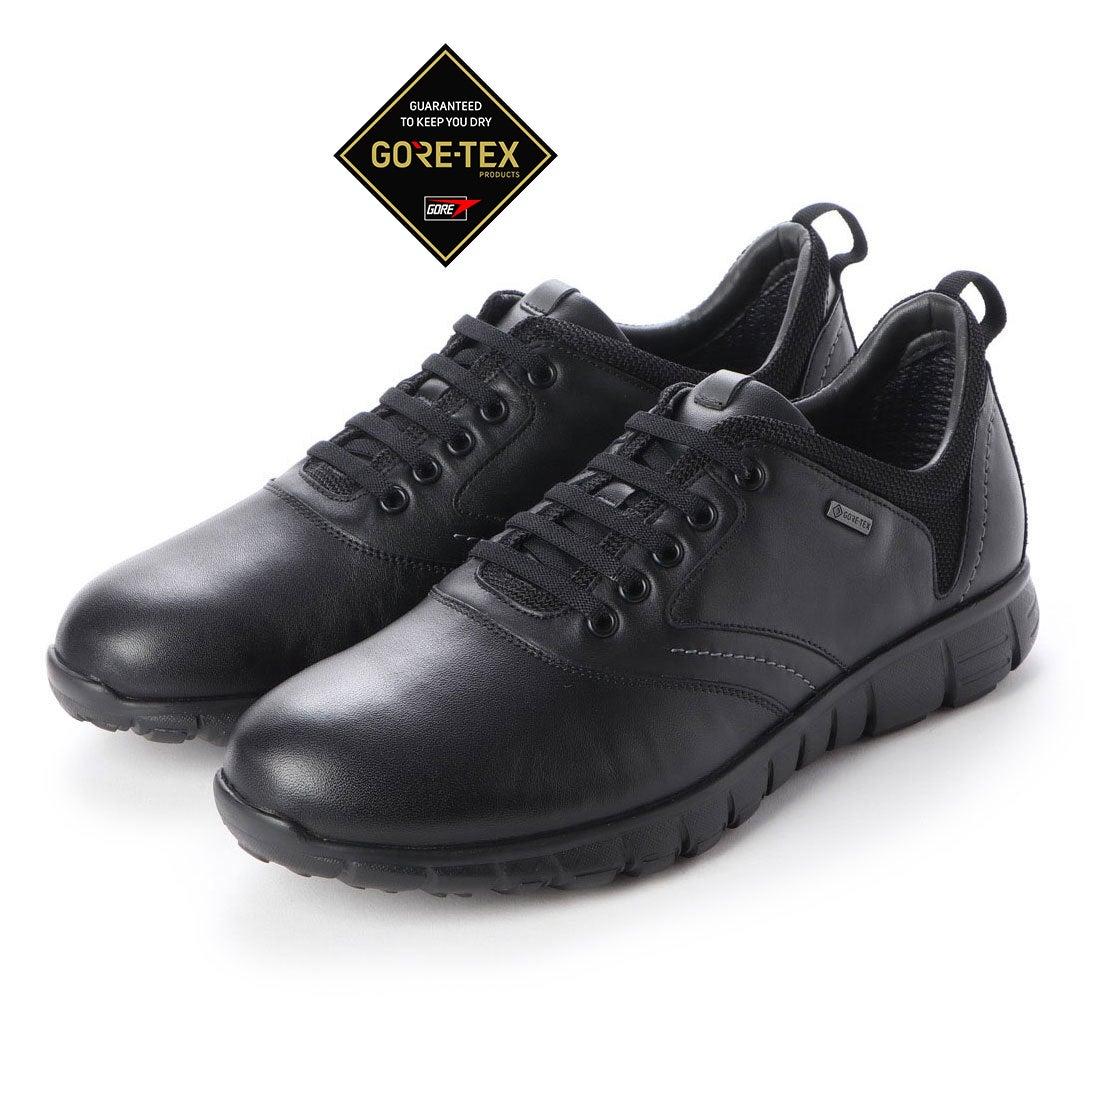 【GORE-TEX】マドラスウォーク madras Walk ゴアテックス トラベルカジュアルシューズ MW8201 (ブラック)